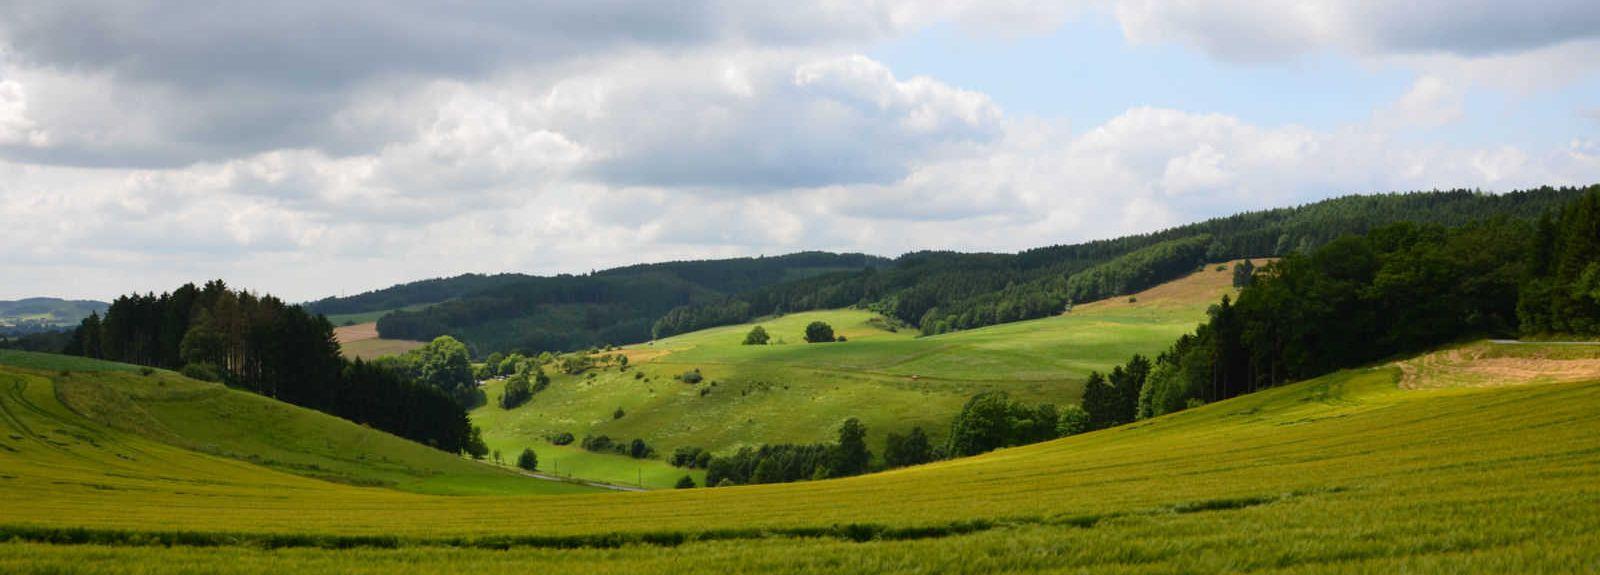 Lennestadt, Renania del Norte-Westfalia, Alemania